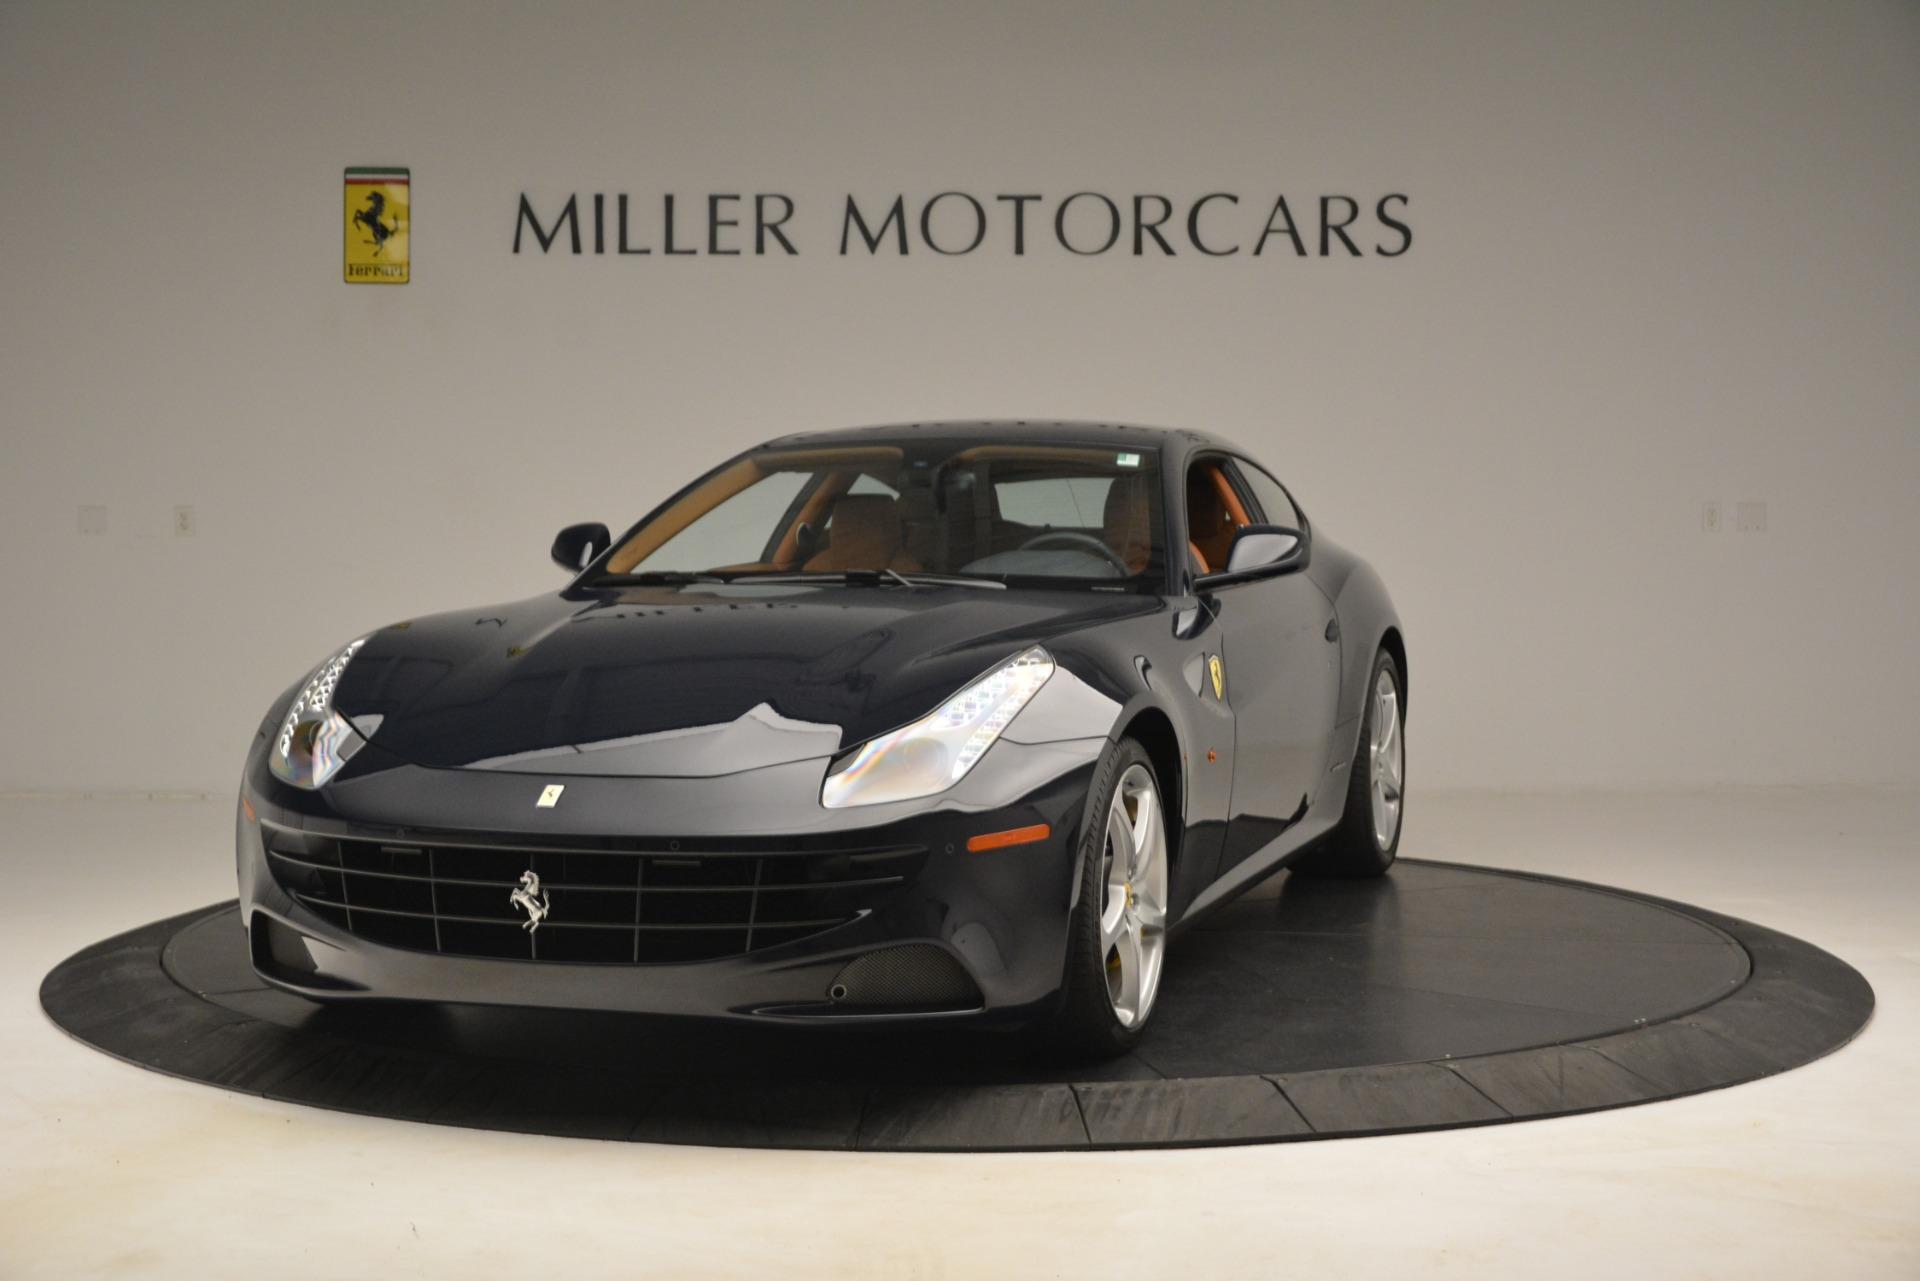 Used 2013 Ferrari FF for sale Sold at Aston Martin of Greenwich in Greenwich CT 06830 1